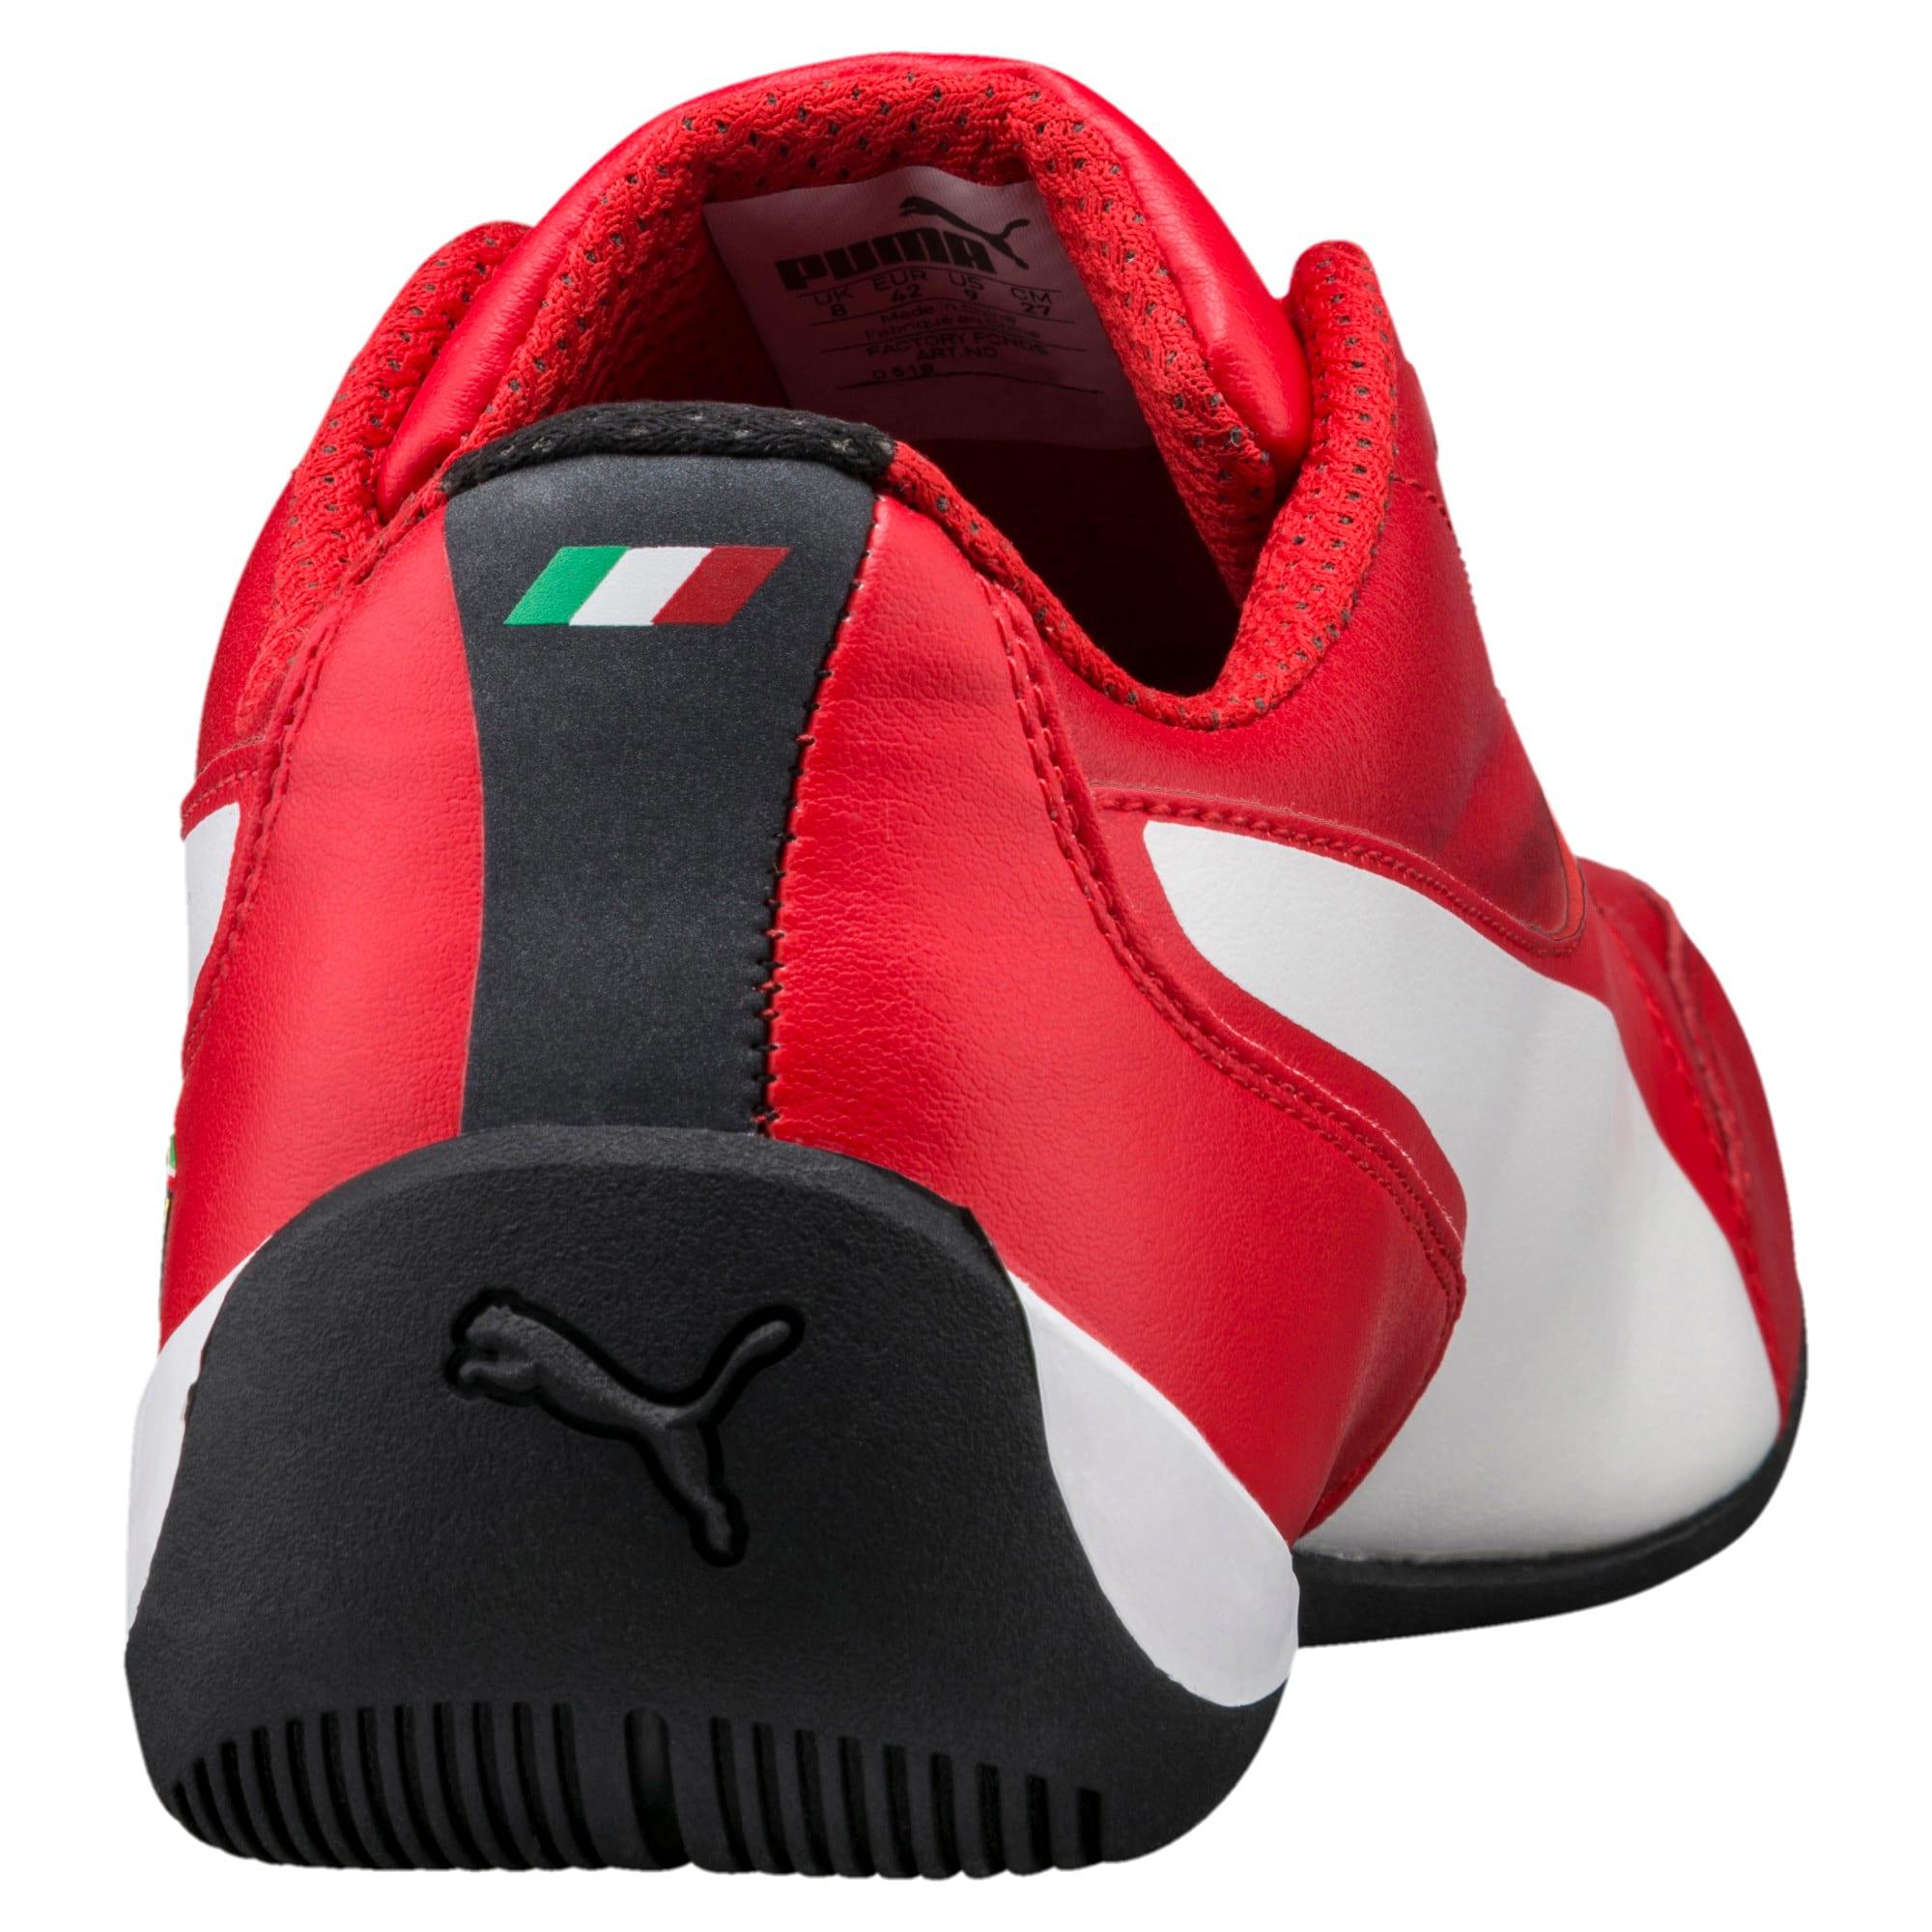 Thumbnail 4 of Scuderia Ferrari Drift Cat 7 Shoes, Rosso Corsa-Puma White-Black, medium